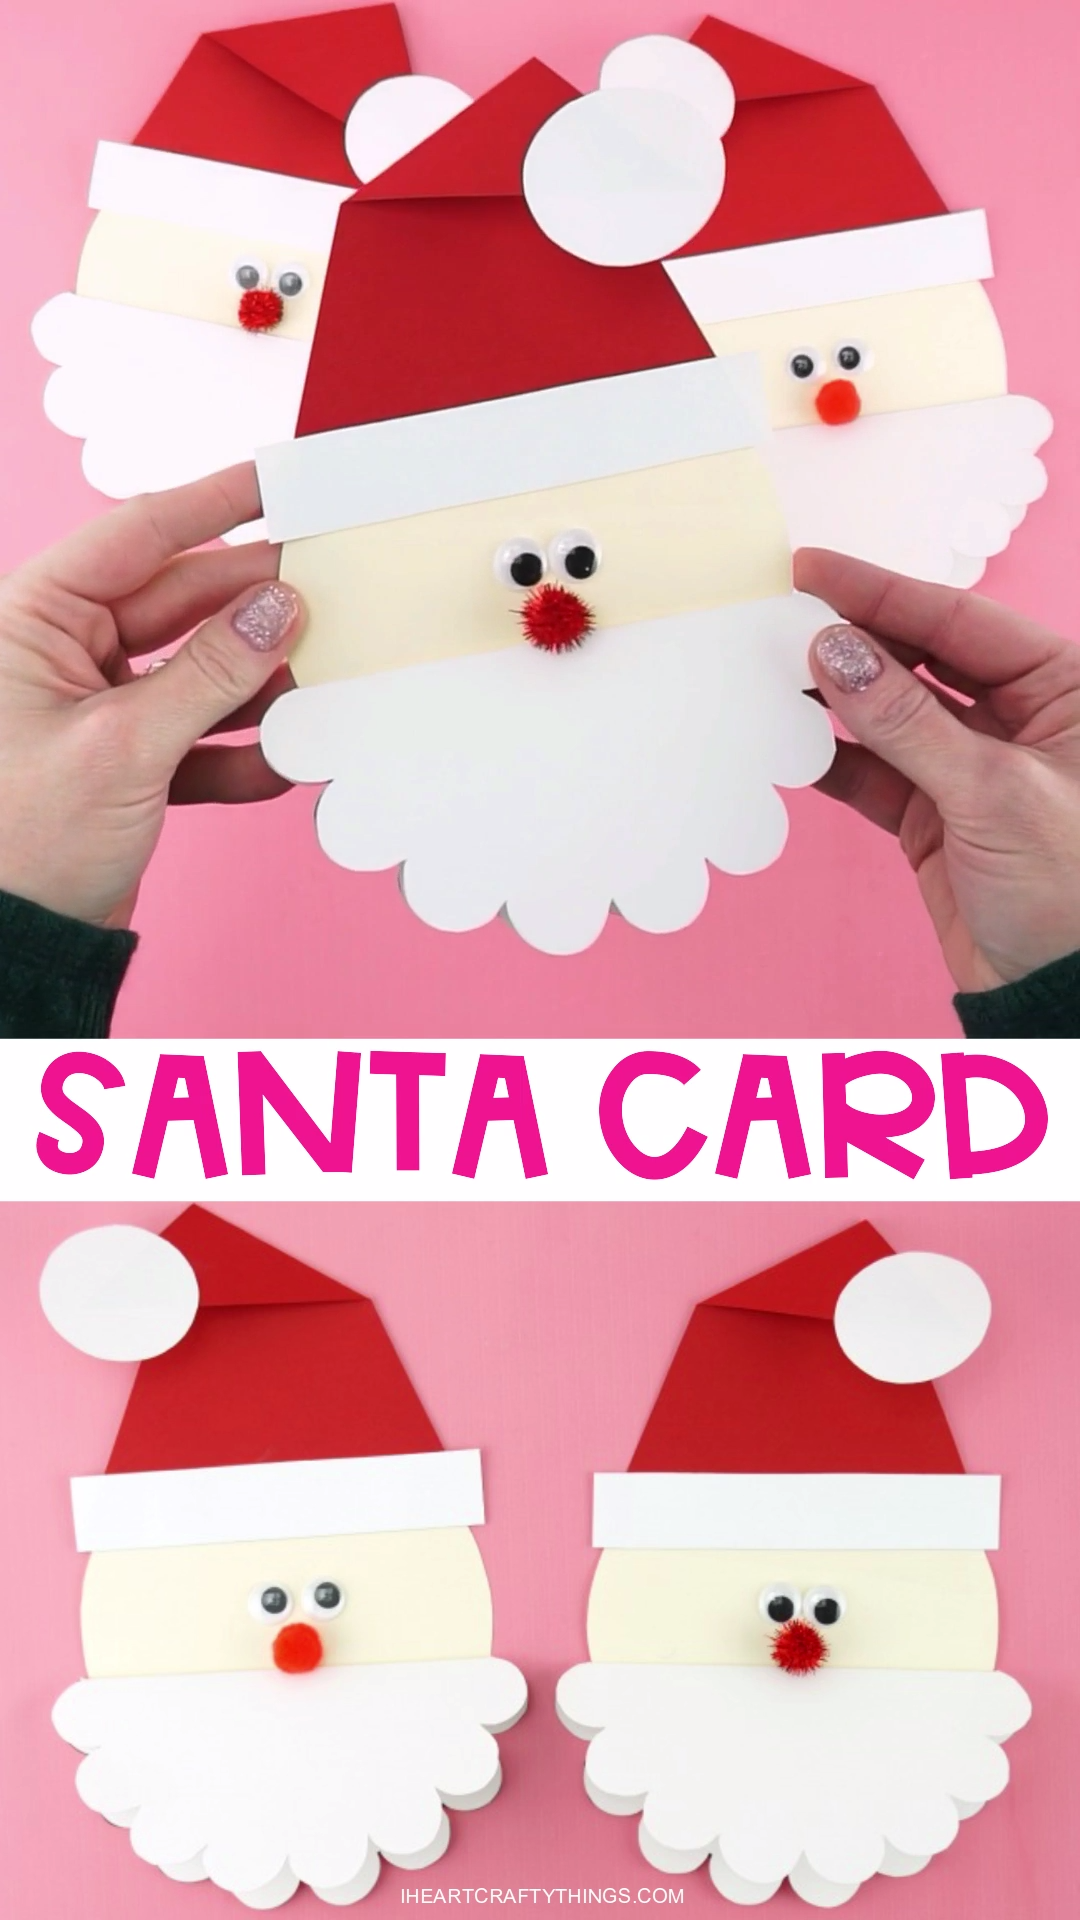 Cute Santa Card Video Video Christmas Cards Handmade Kids Christmas Card Crafts Christmas Cards Handmade